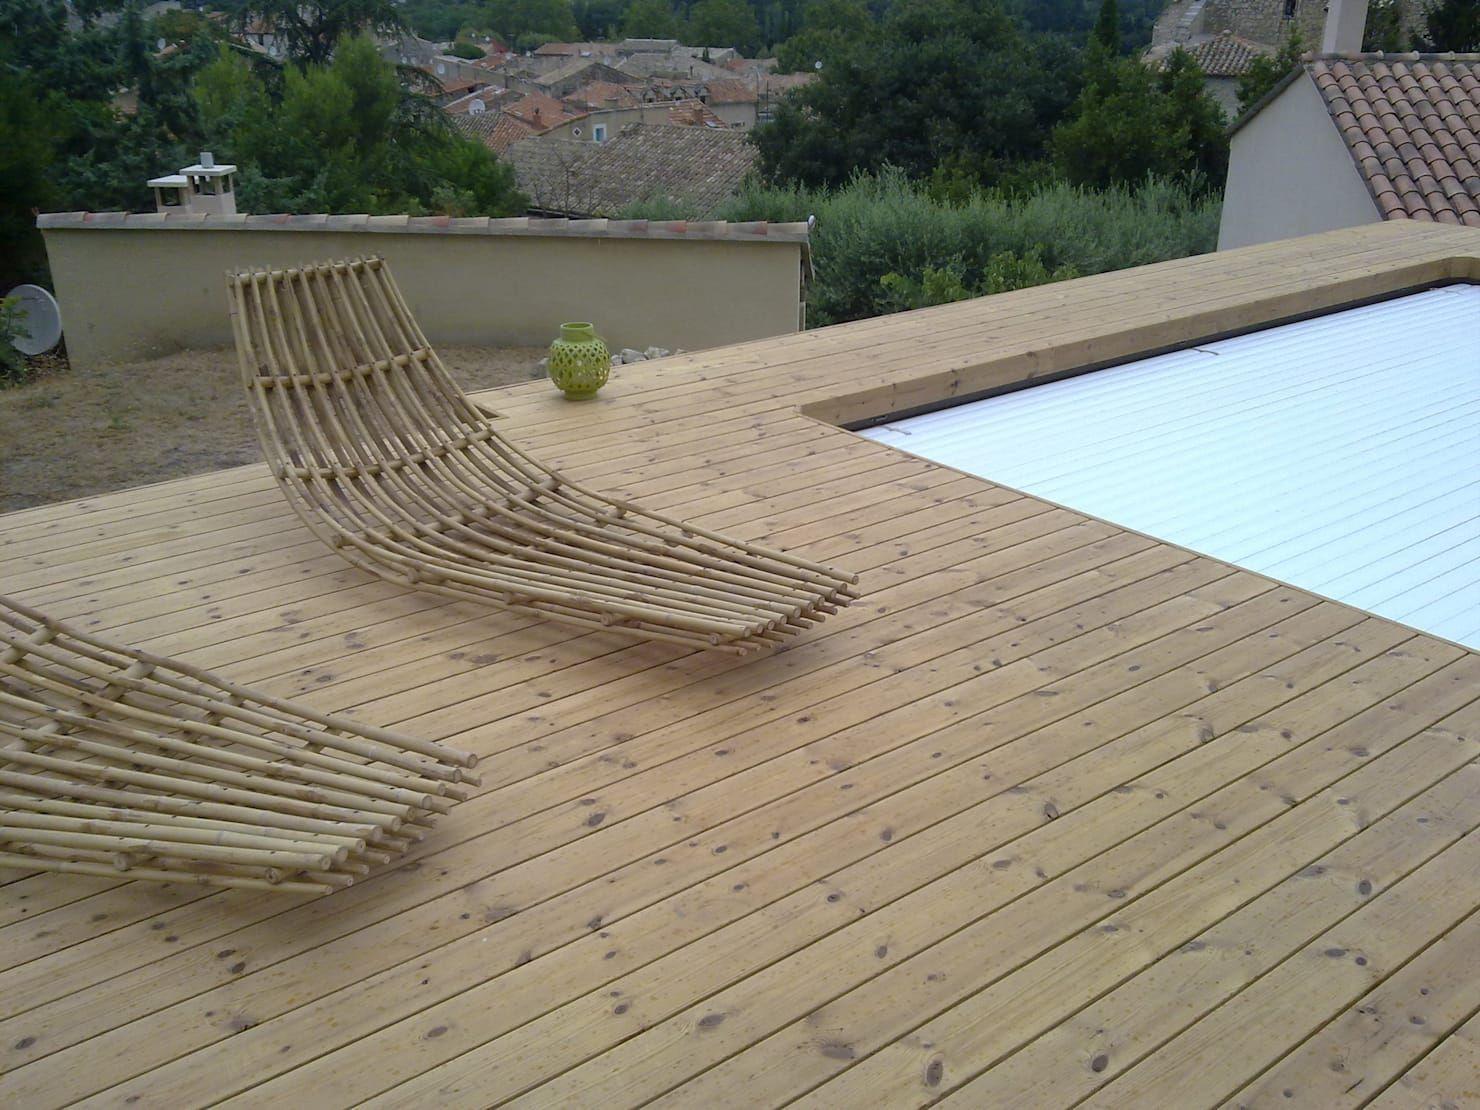 Den Pool Kindersicher Machen | Terassenideen, Moderne Pools ... avec Pose Terrasse Antony